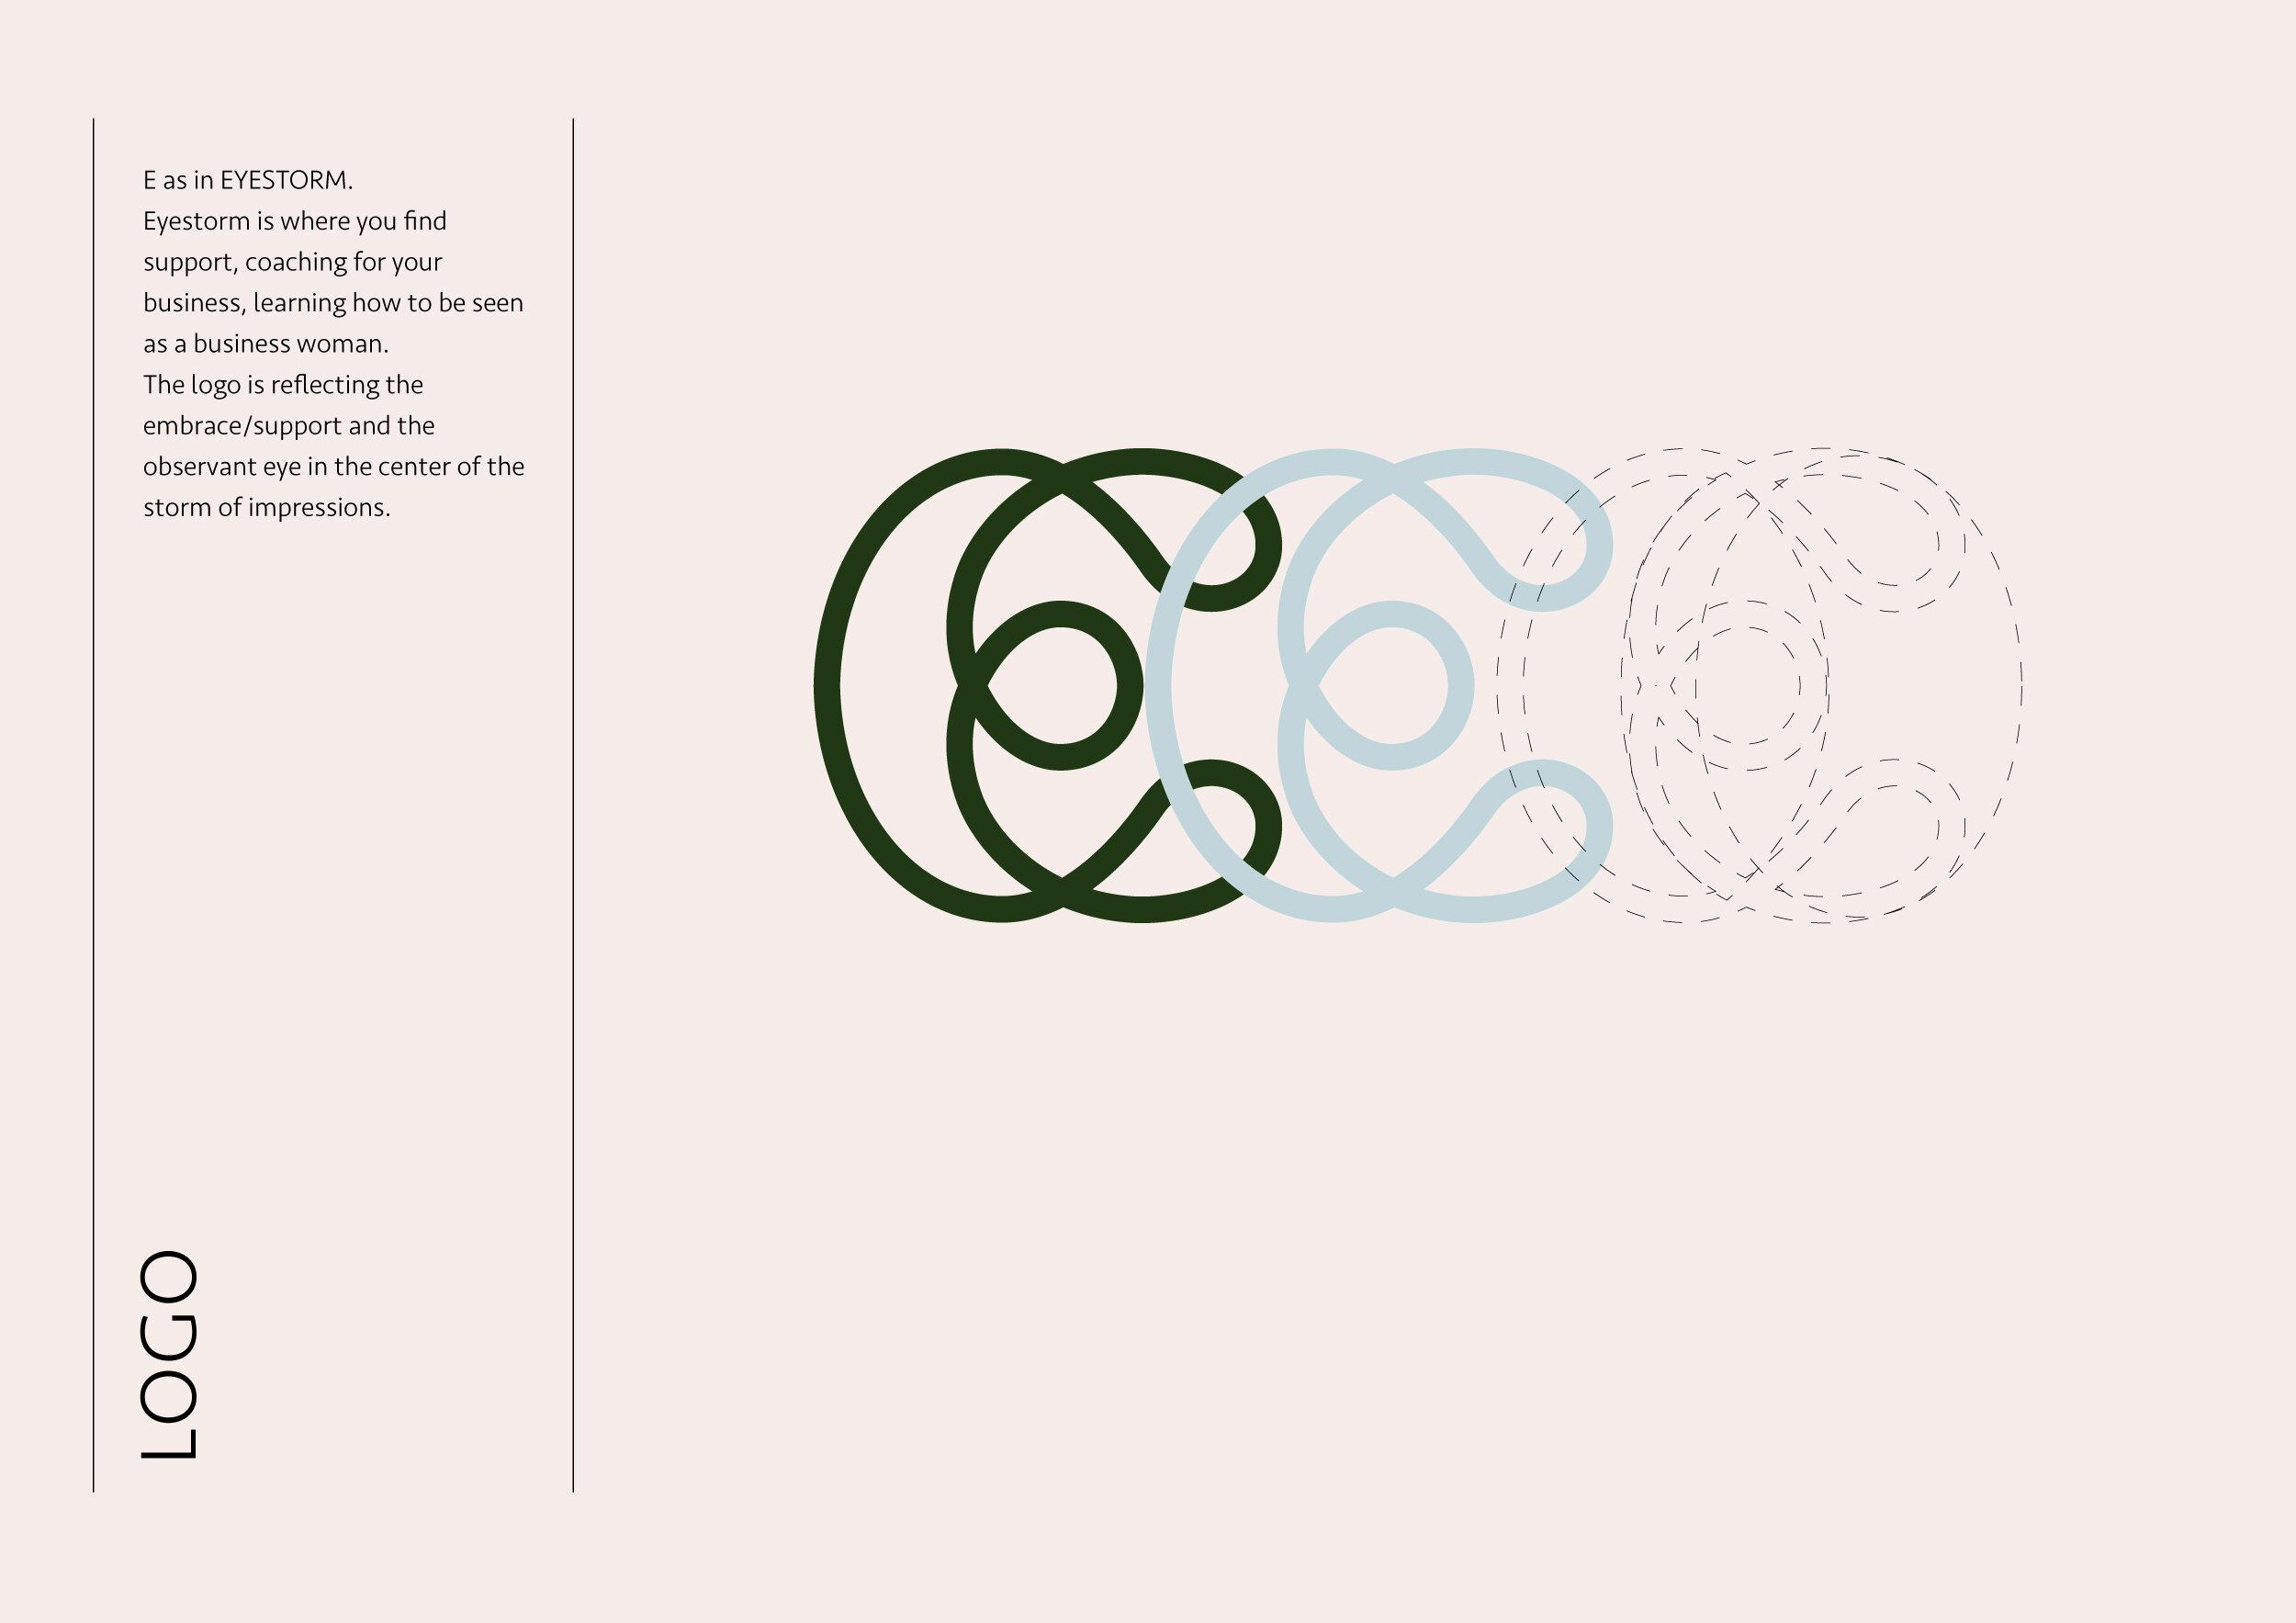 Eyestorm_brand_guide-2.jpg